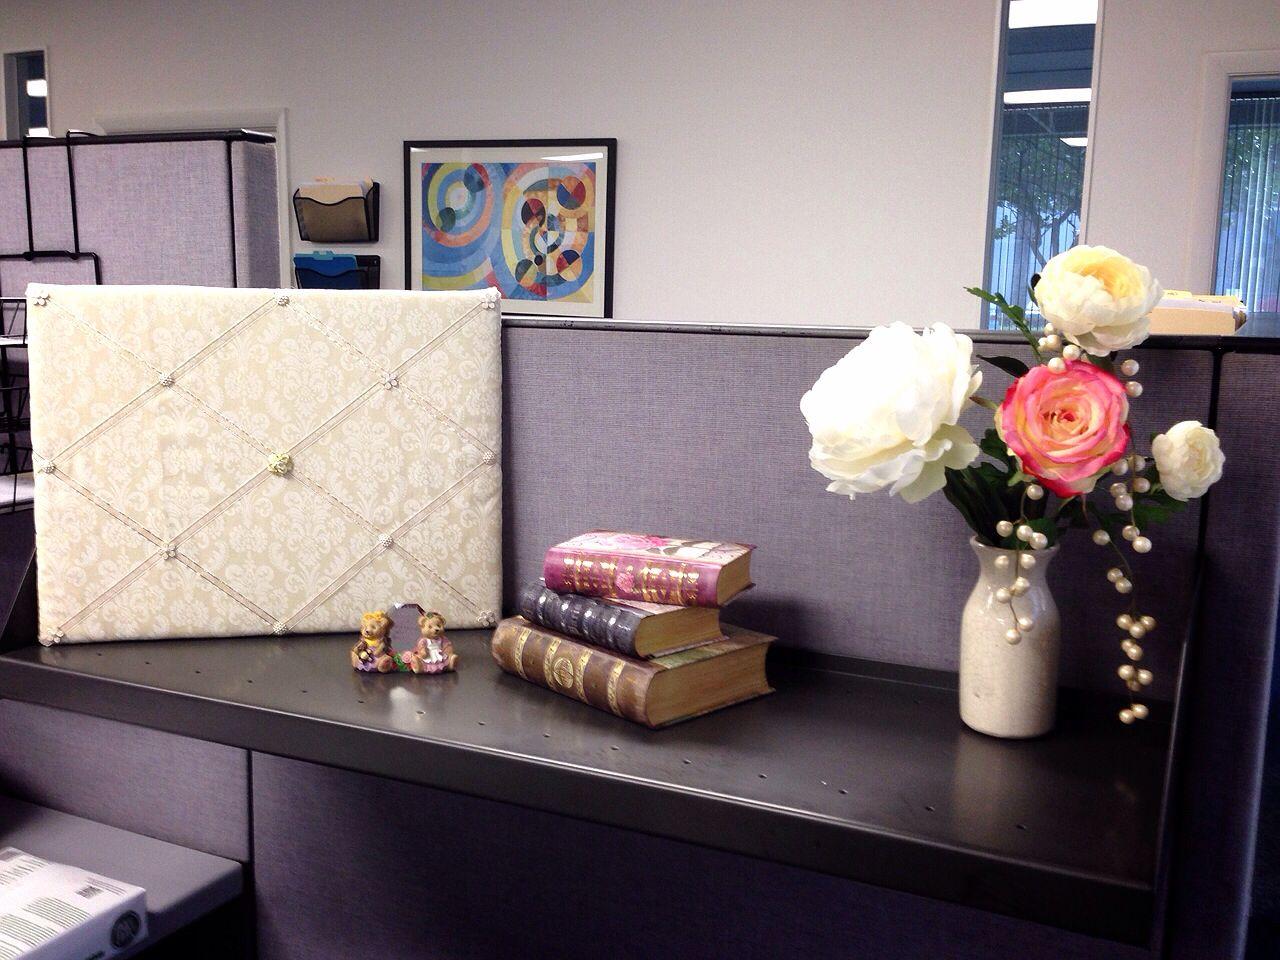 Hott cubicle decor Cubicle decor office Work space